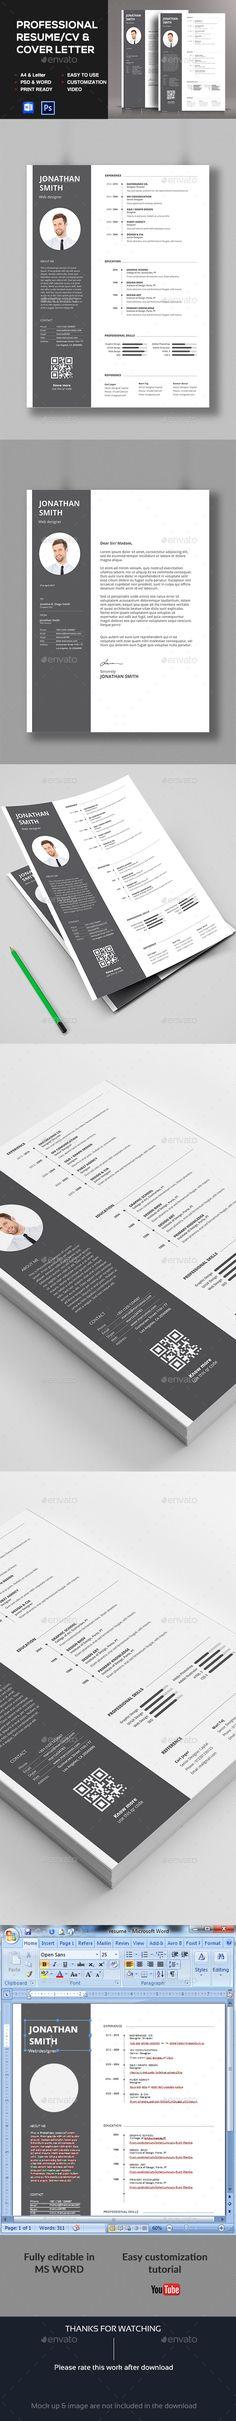 resume psd template resume booklet multipurpose download